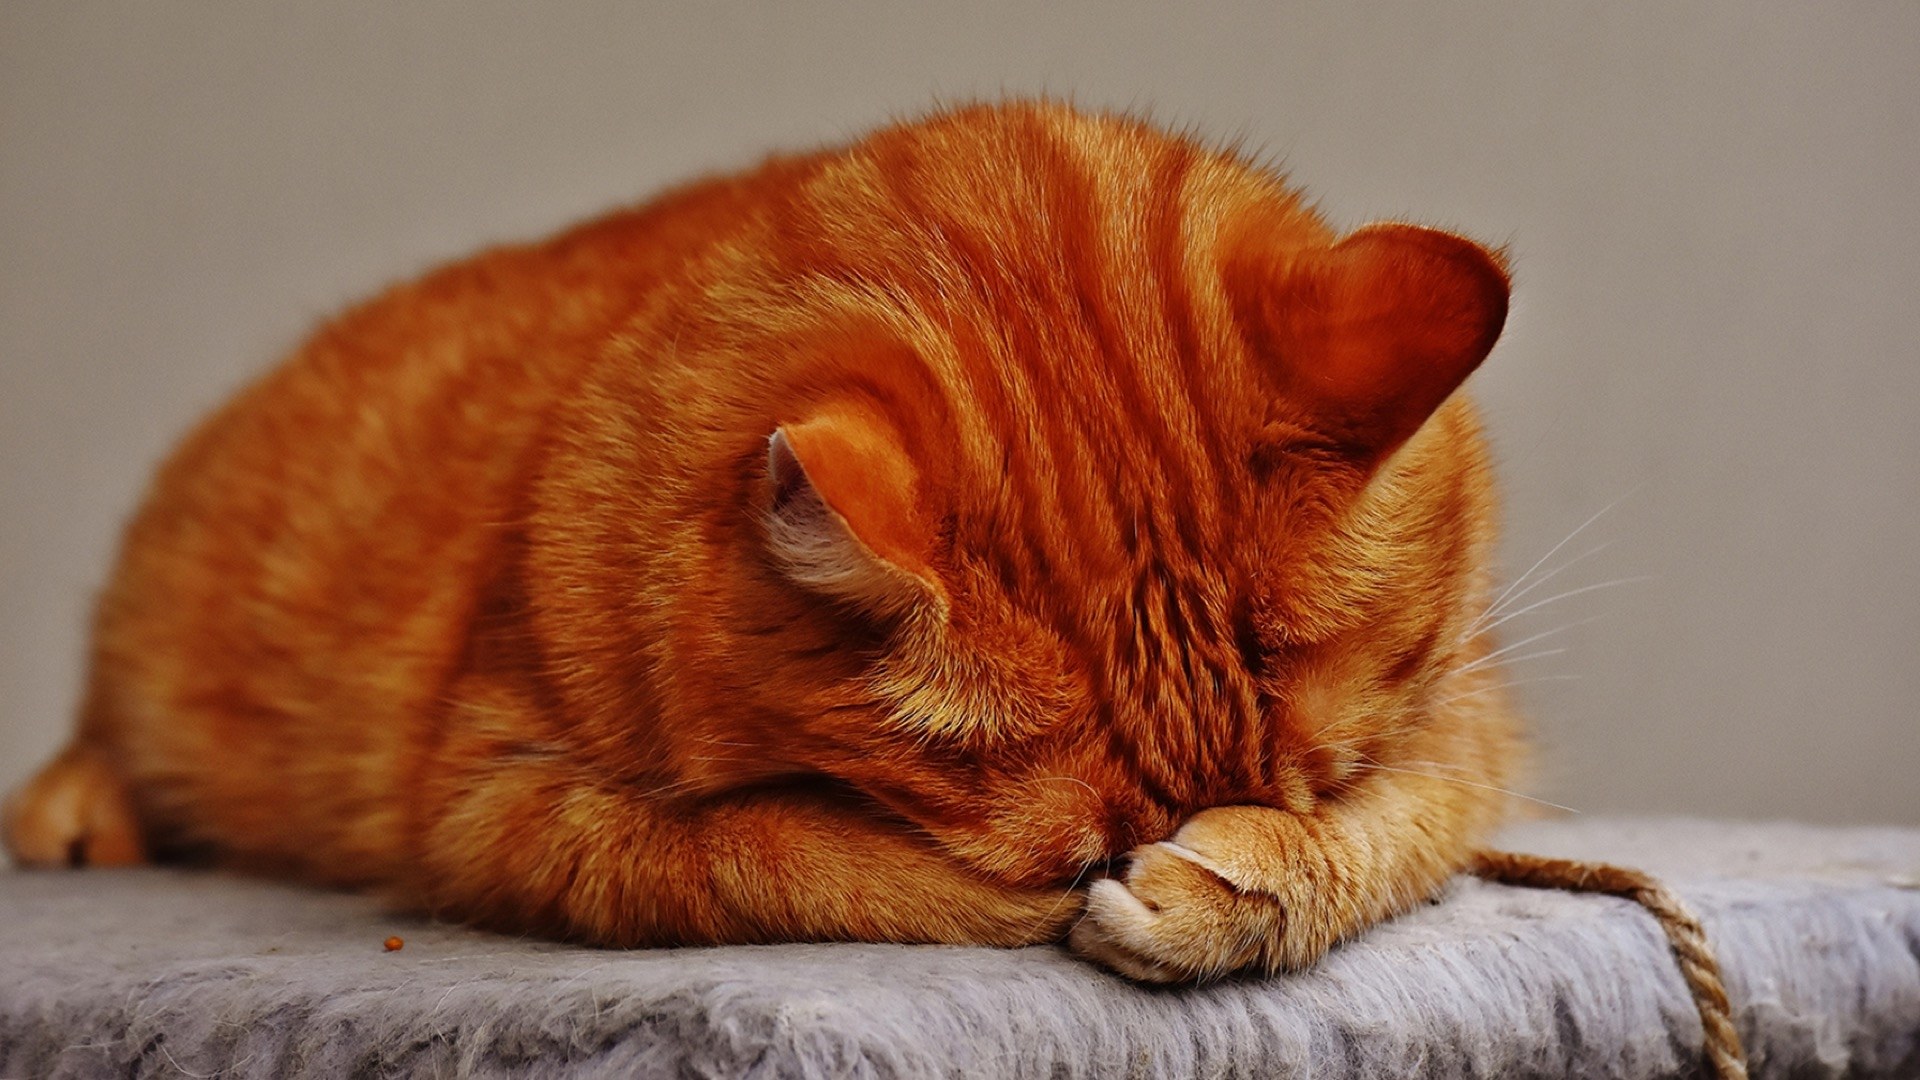 orange kitten hiding its eyes